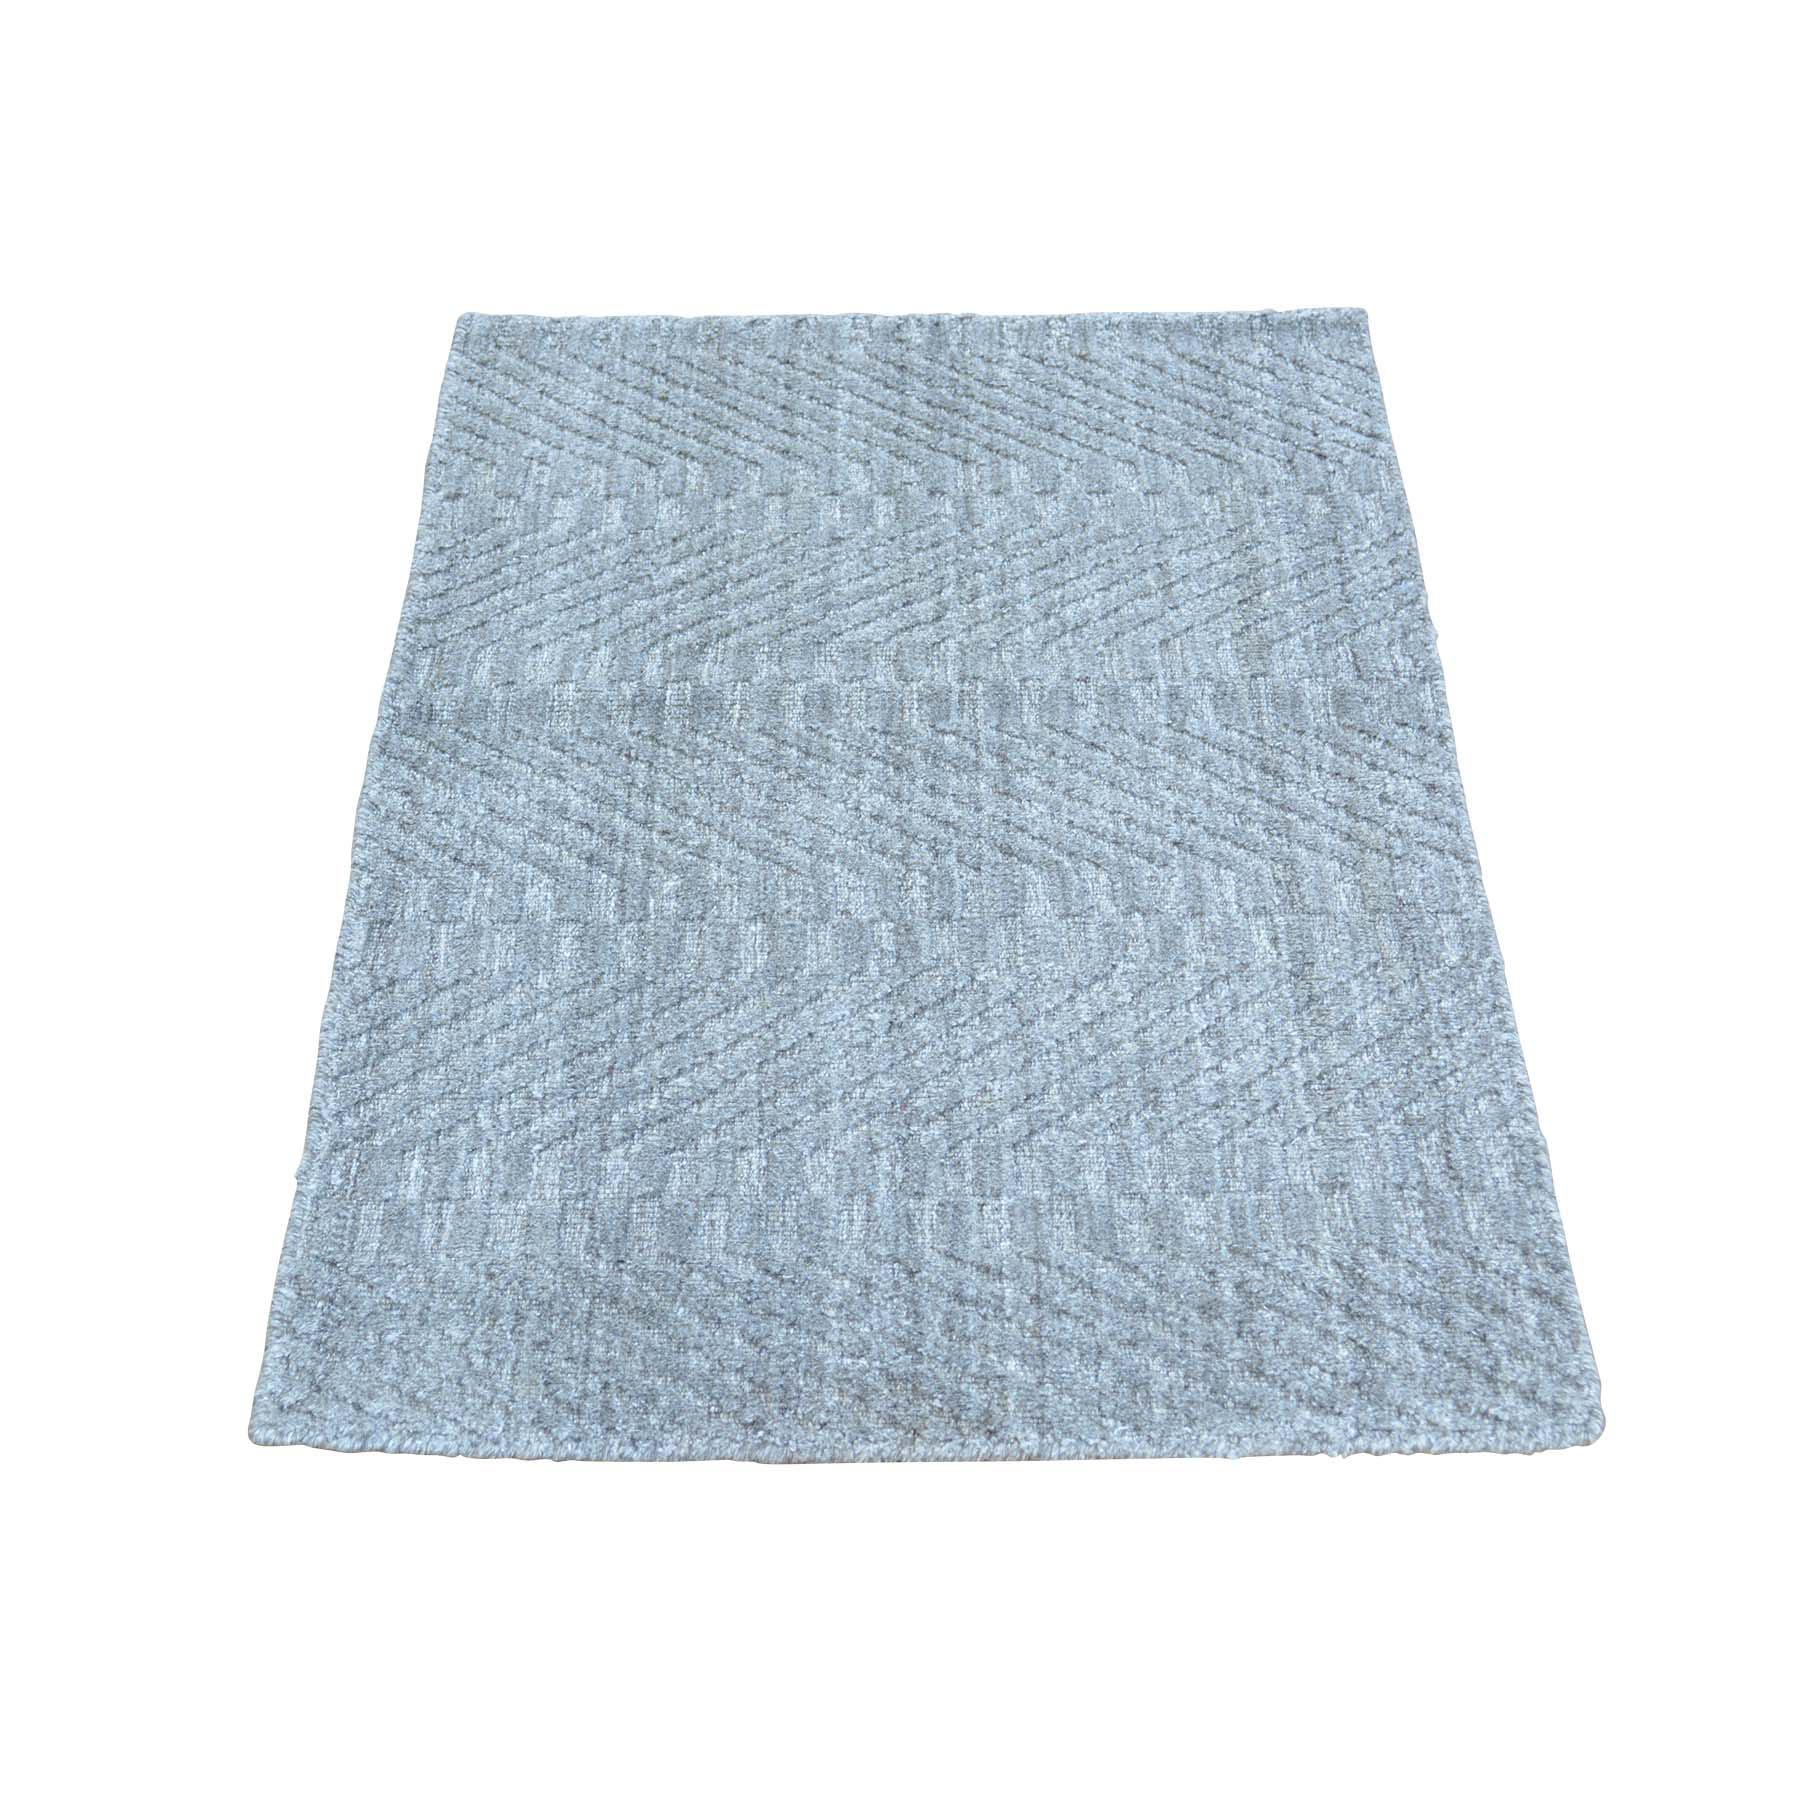 2'X3' Grey Tone On Tone Hand Loomed Wool And Silk Rug moab99da